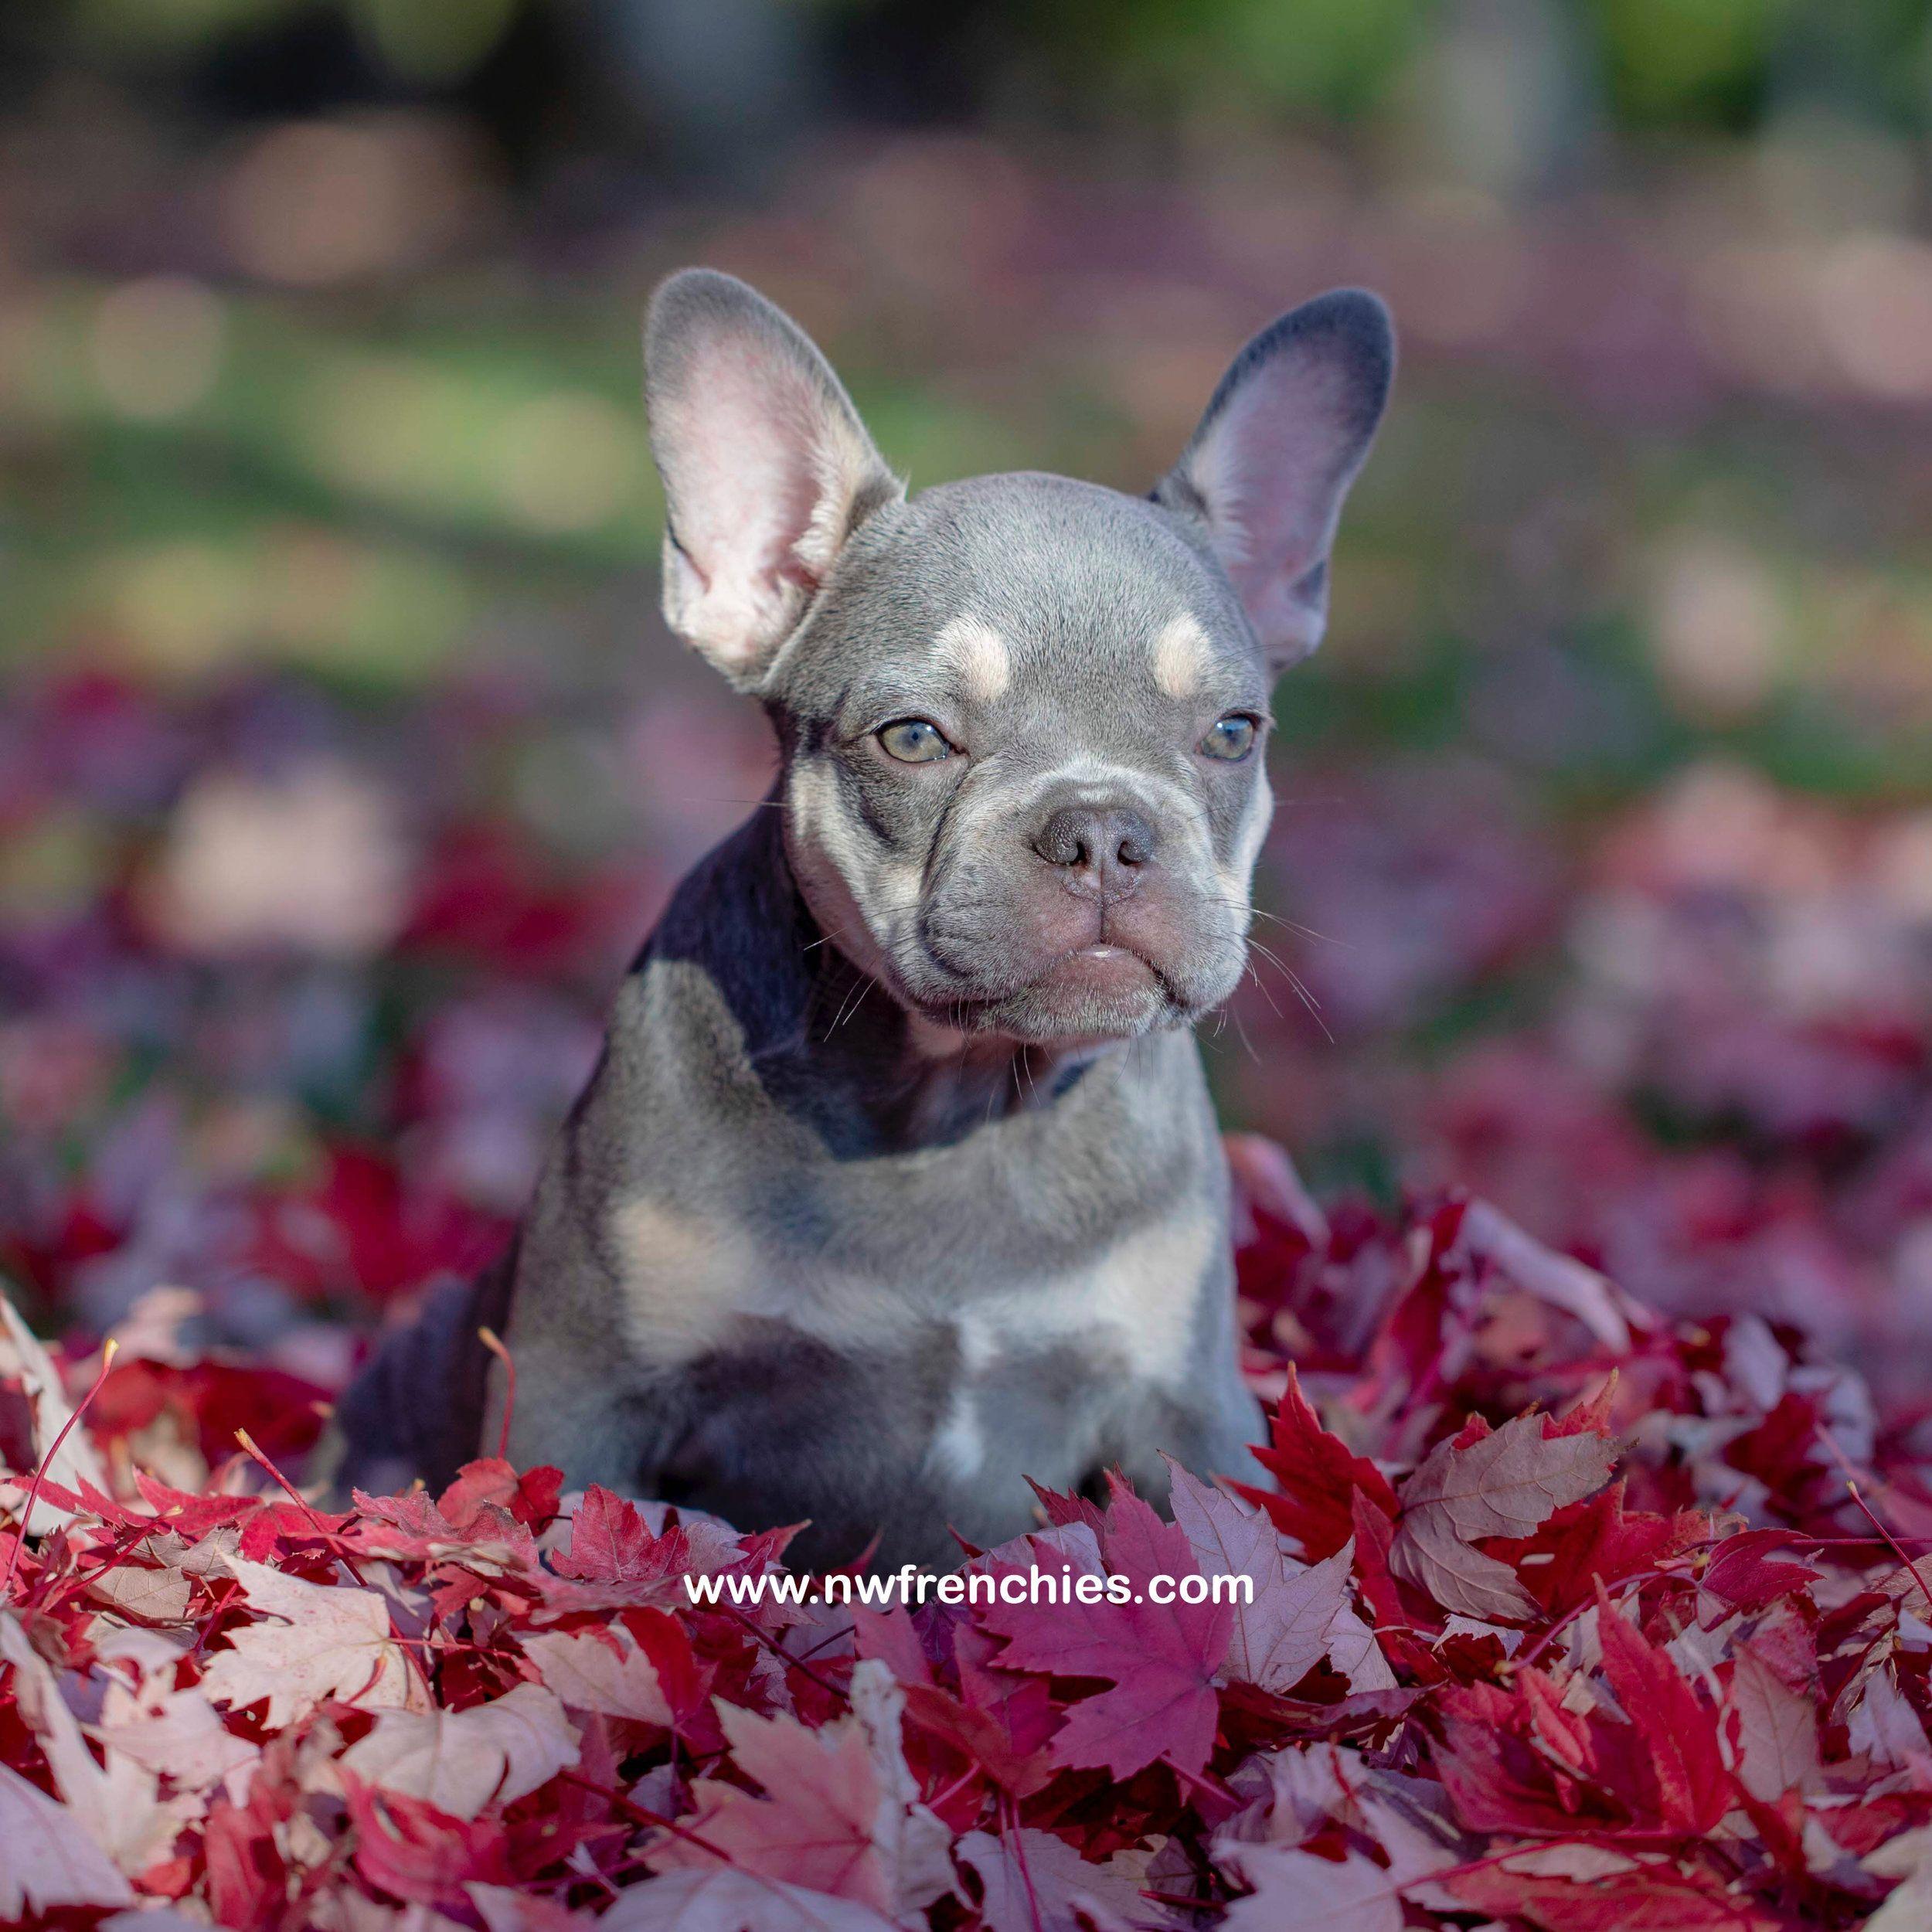 Nw Frenchies Lilac French Bulldog Www Nwfrenchies Com French Bulldog Breeder In Washington State Frenchiepuppy Bulldog Puppies French Bulldog French Bulldog Puppies